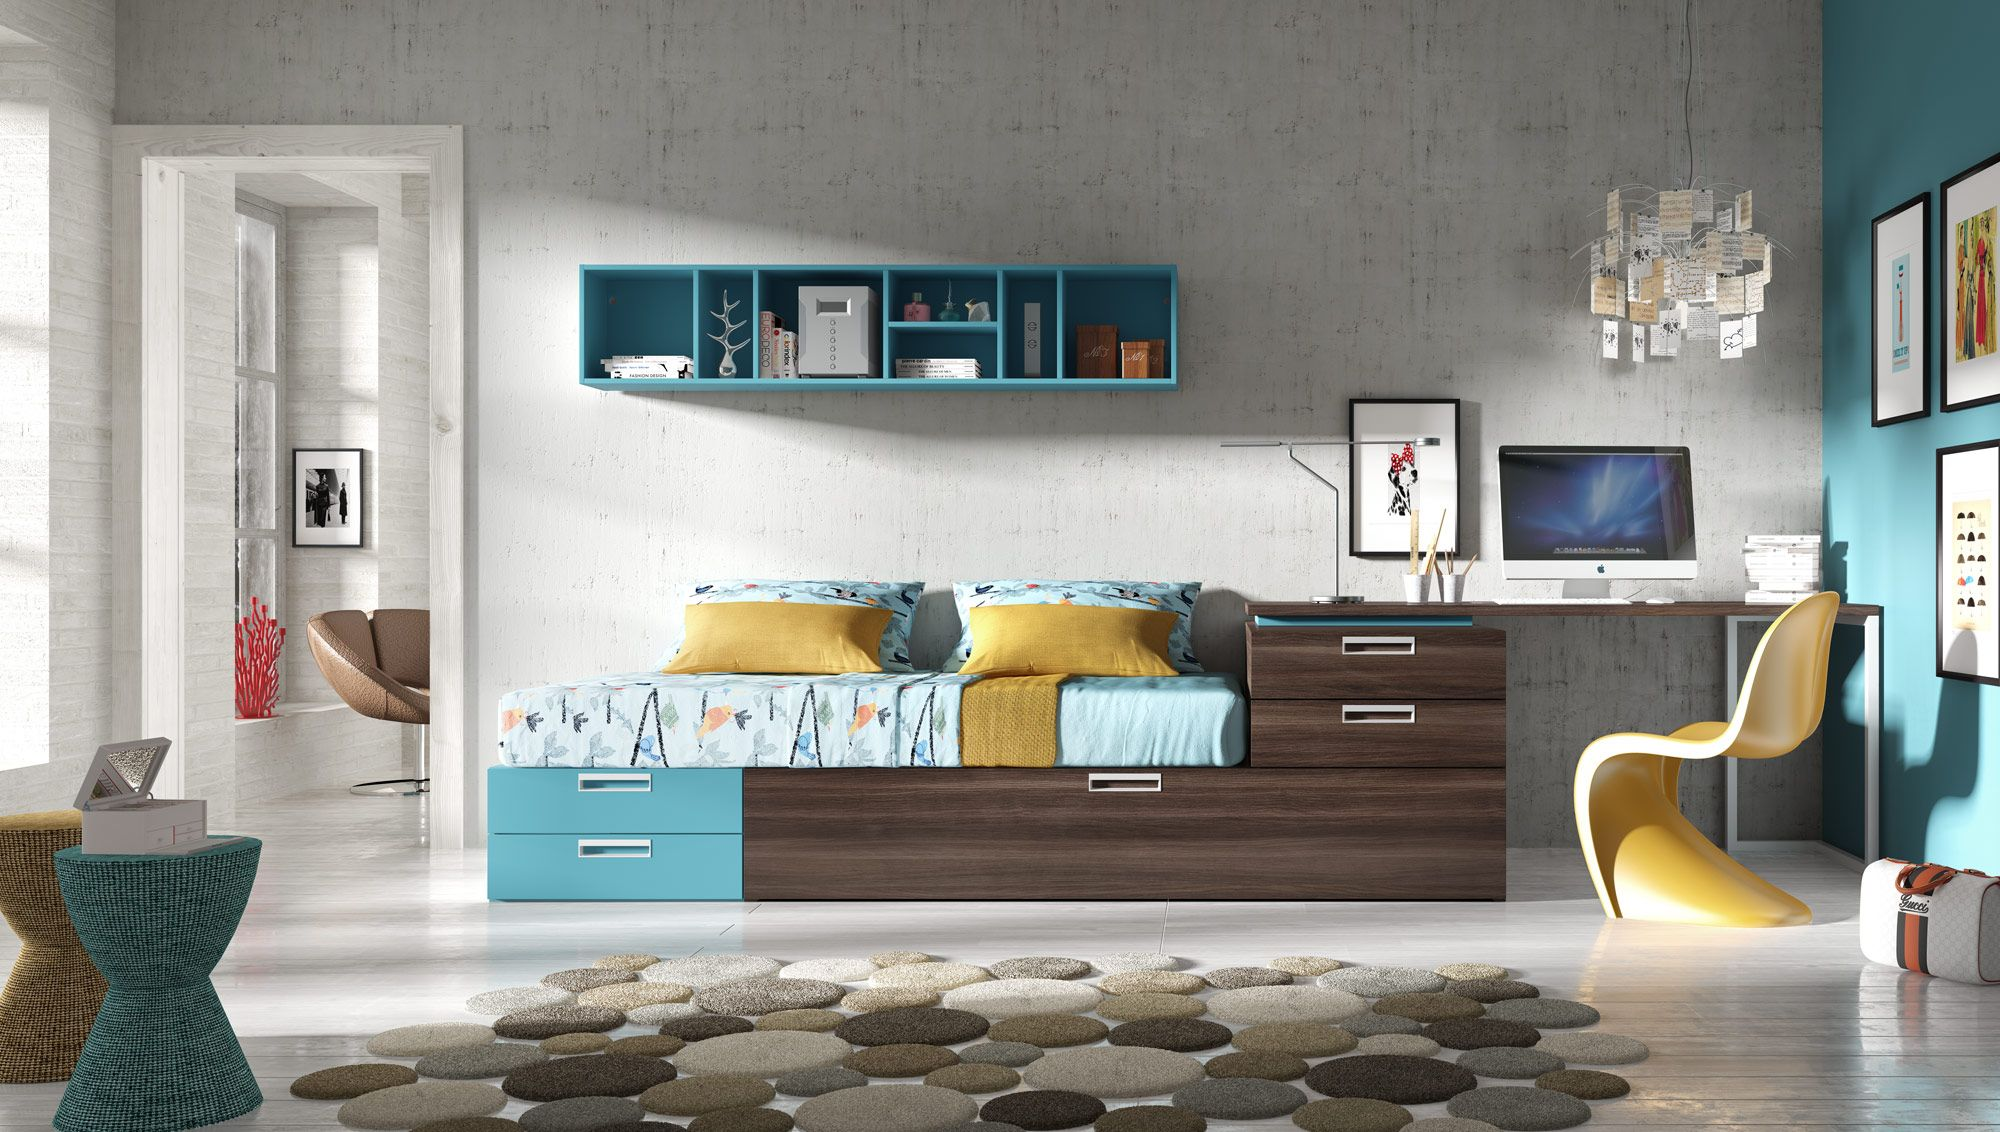 Tribu snap l36 muebles hermida world of decor pinterest camas bajas composici n y juveniles - Hermida muebles ...